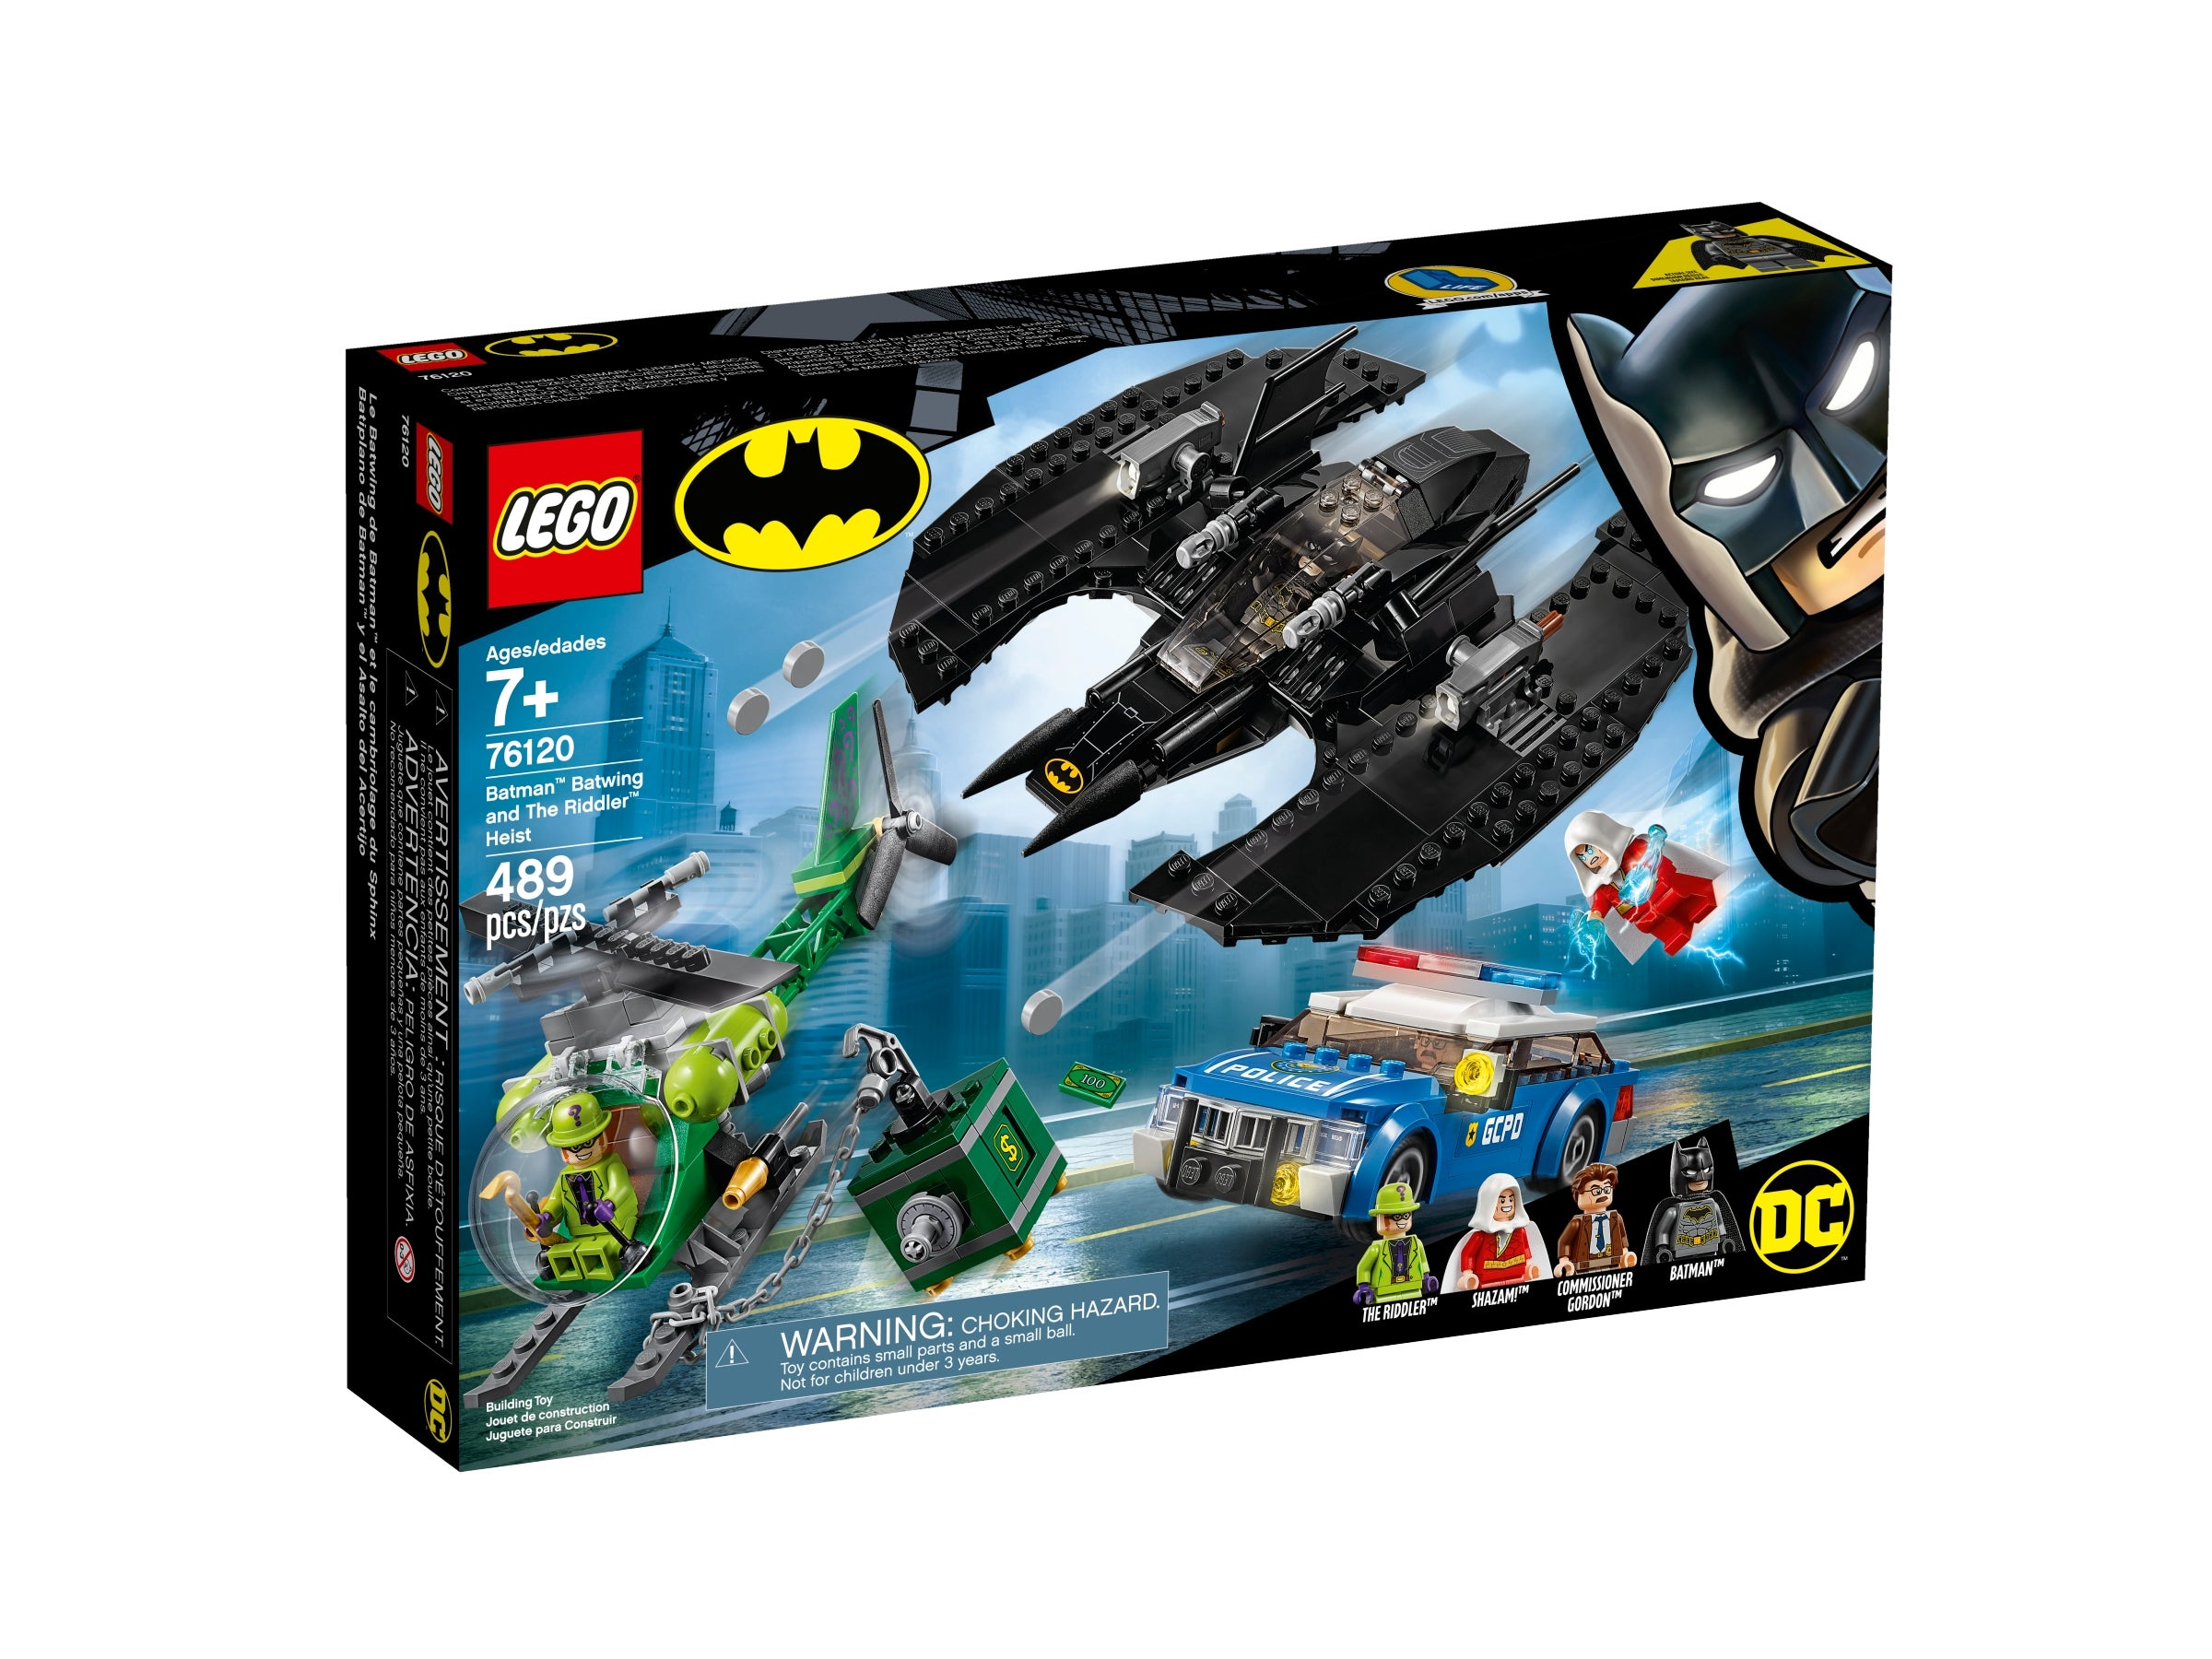 76120 Lego Batman Batwing and The Riddler Heist DC Batman